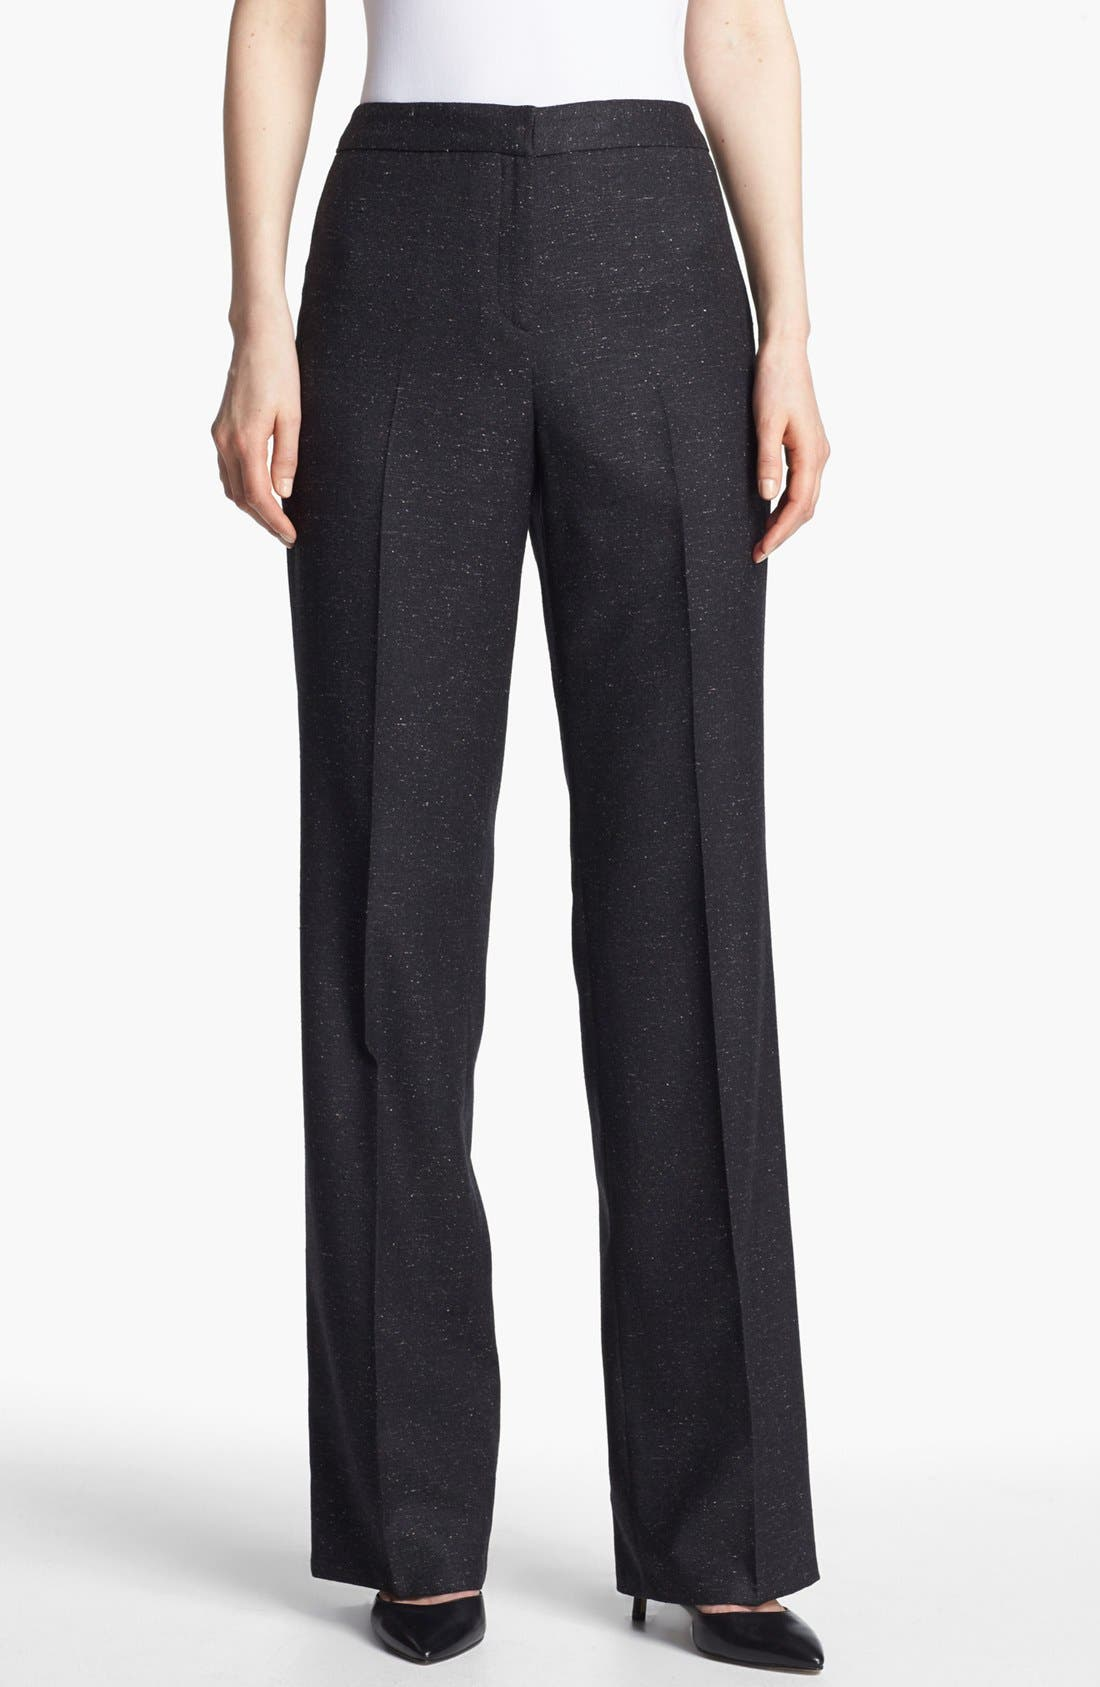 Main Image - Santorelli 'Mara' Tweed Trousers